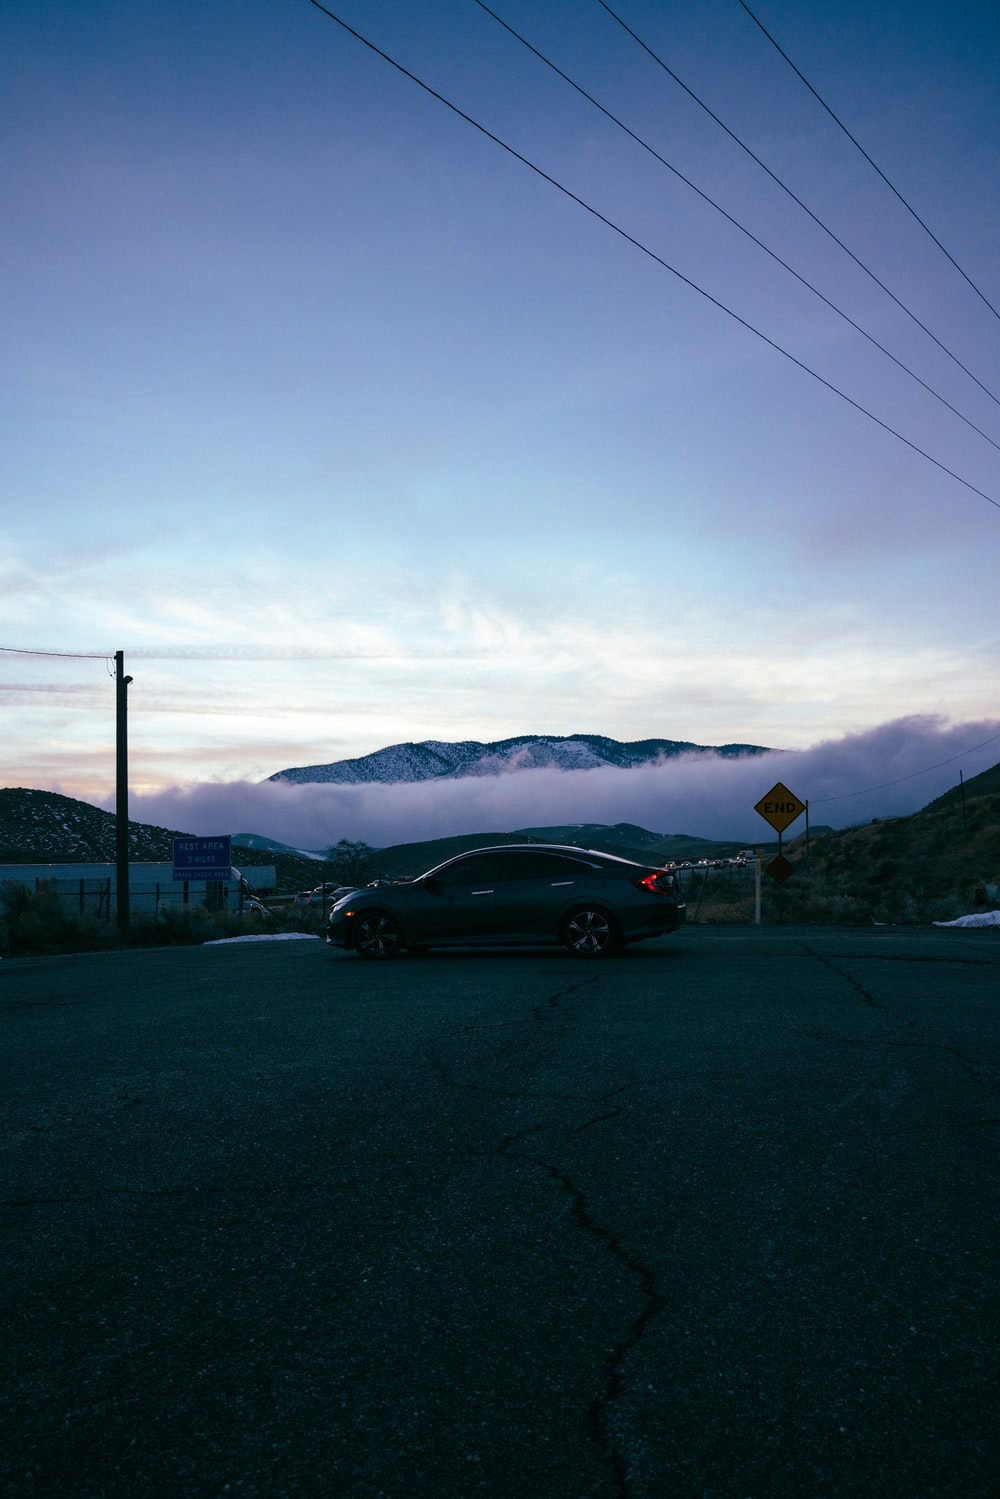 black sedan on road during daytime